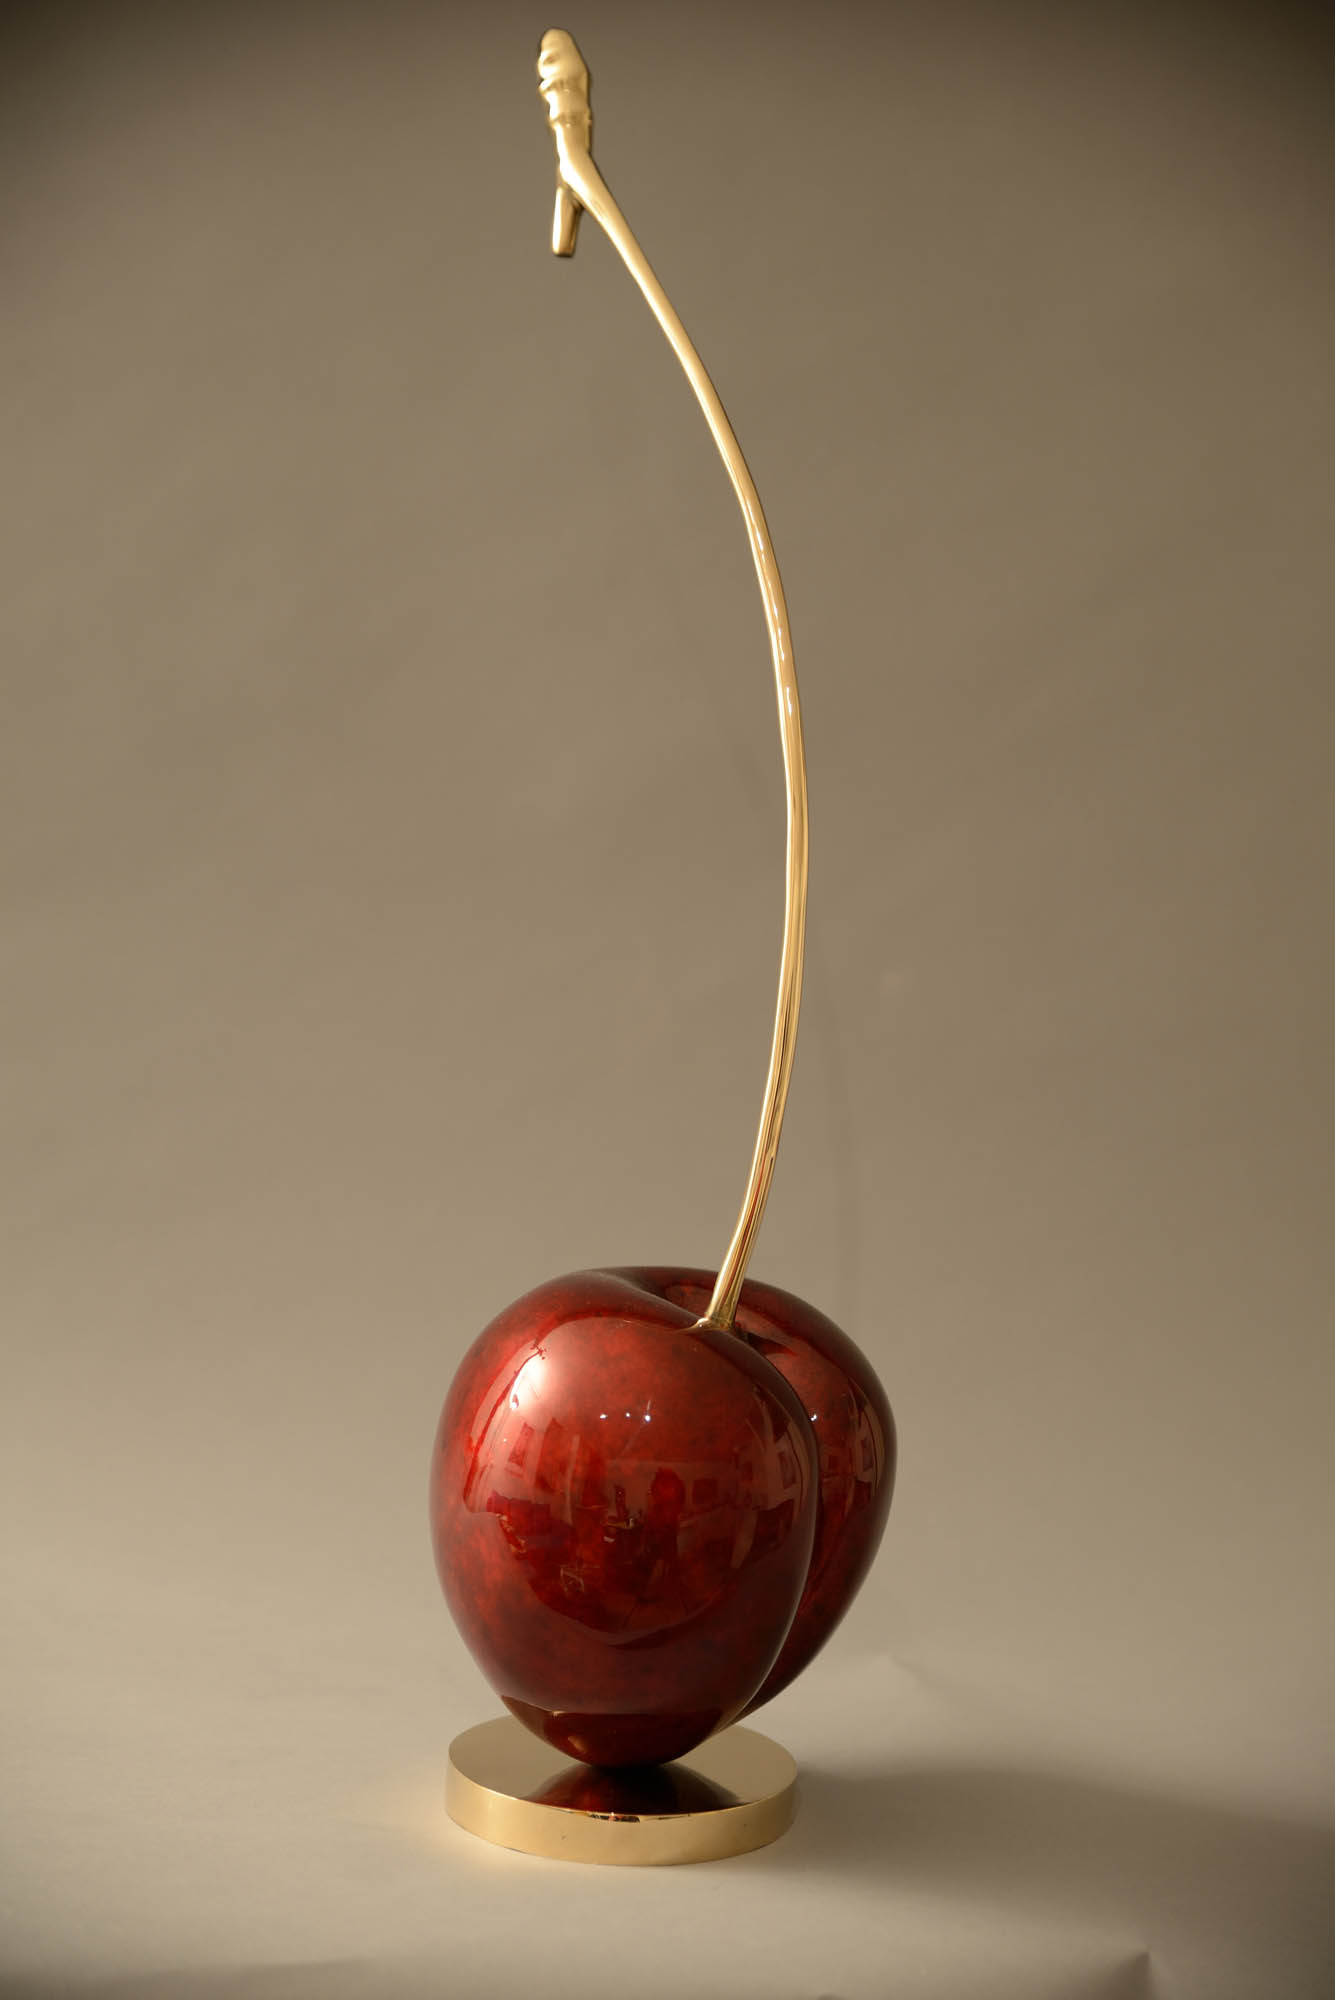 fruit-cherries-single-lc